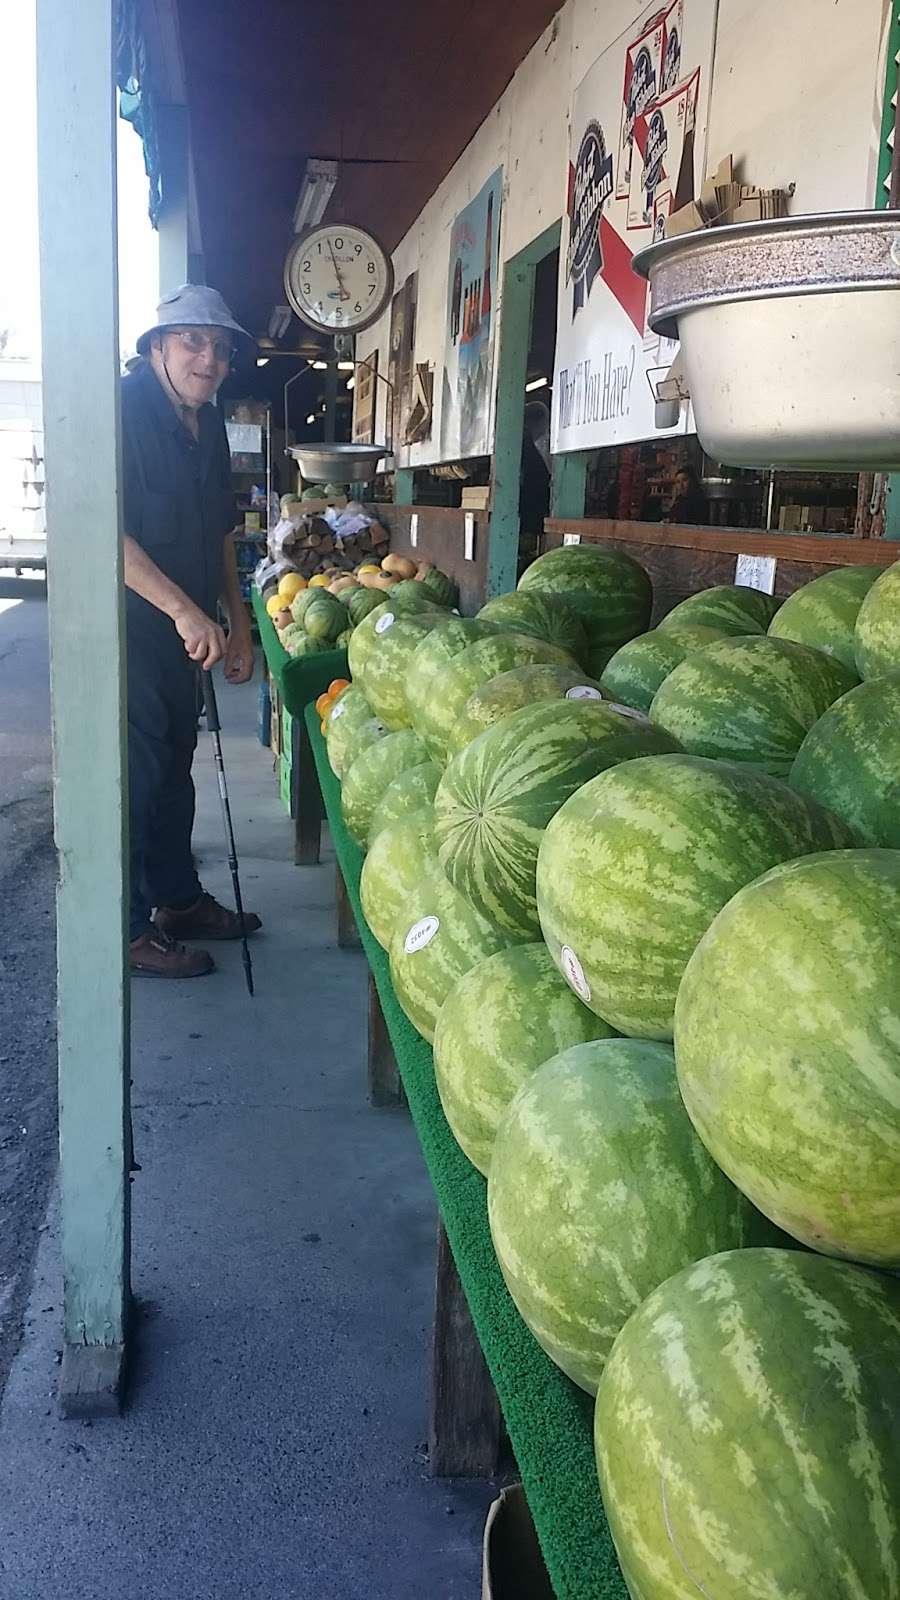 Palace of Fruit - store  | Photo 9 of 10 | Address: 8 Ely Rd N, Petaluma, CA 94954, USA | Phone: (707) 795-5311